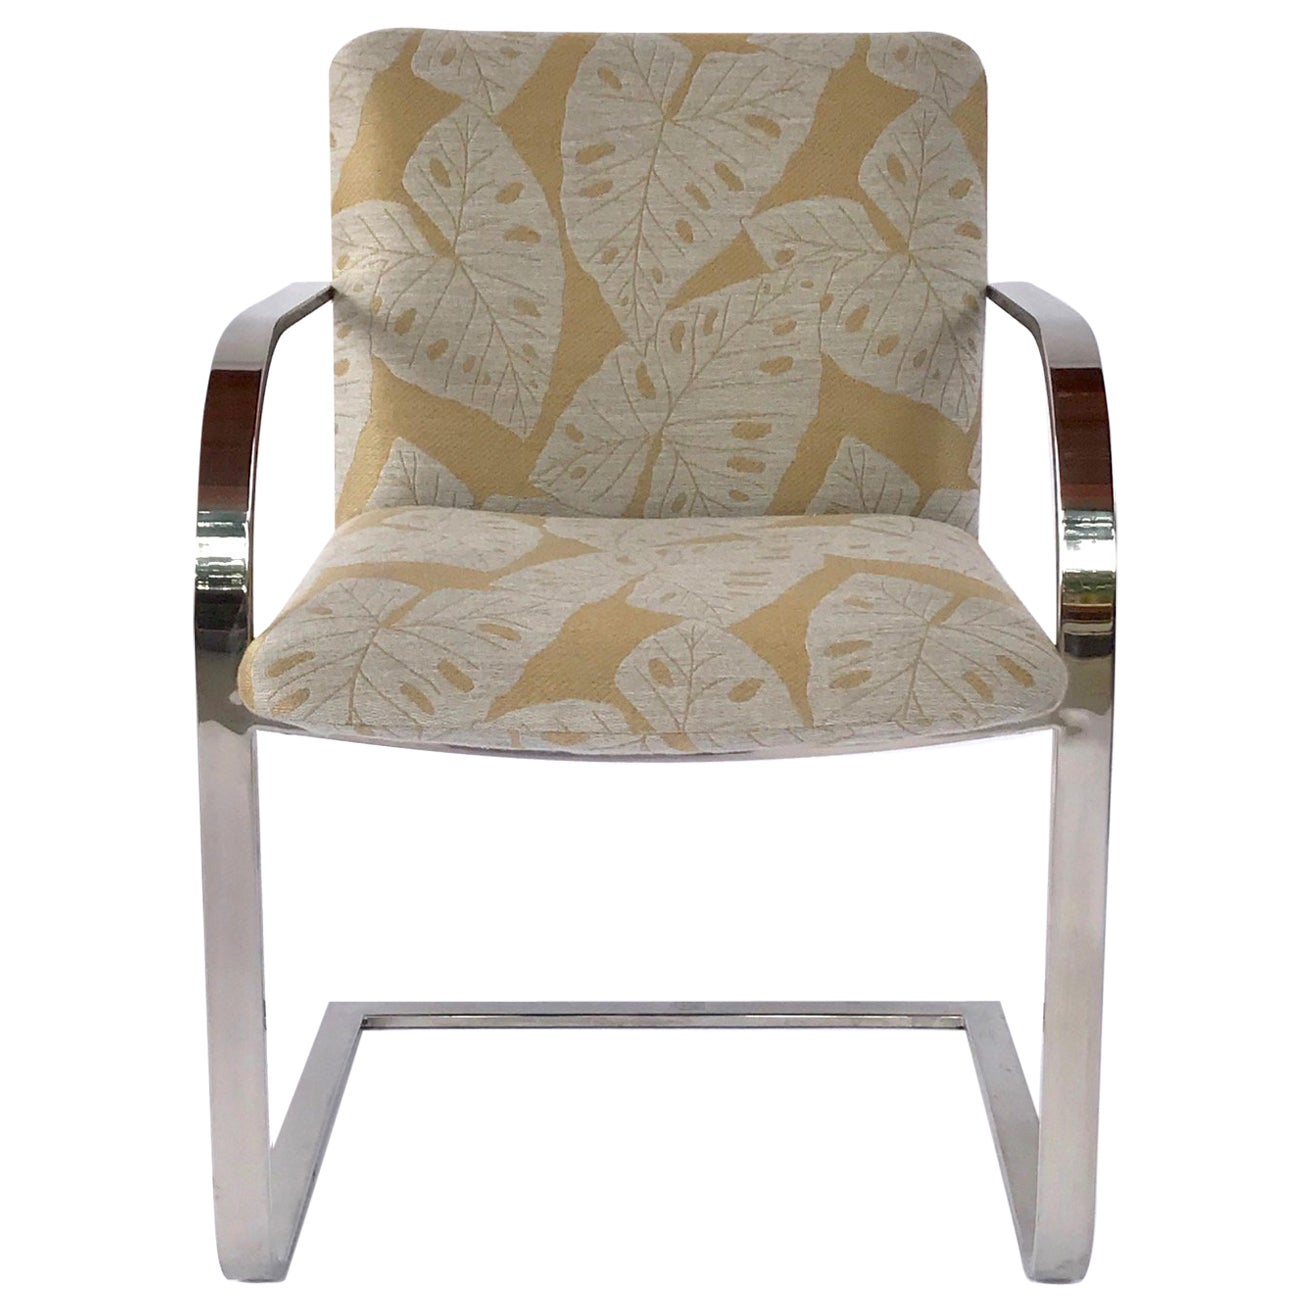 Mid-Century Modern Chrome Desk Chair with Tropical Print by Brueton